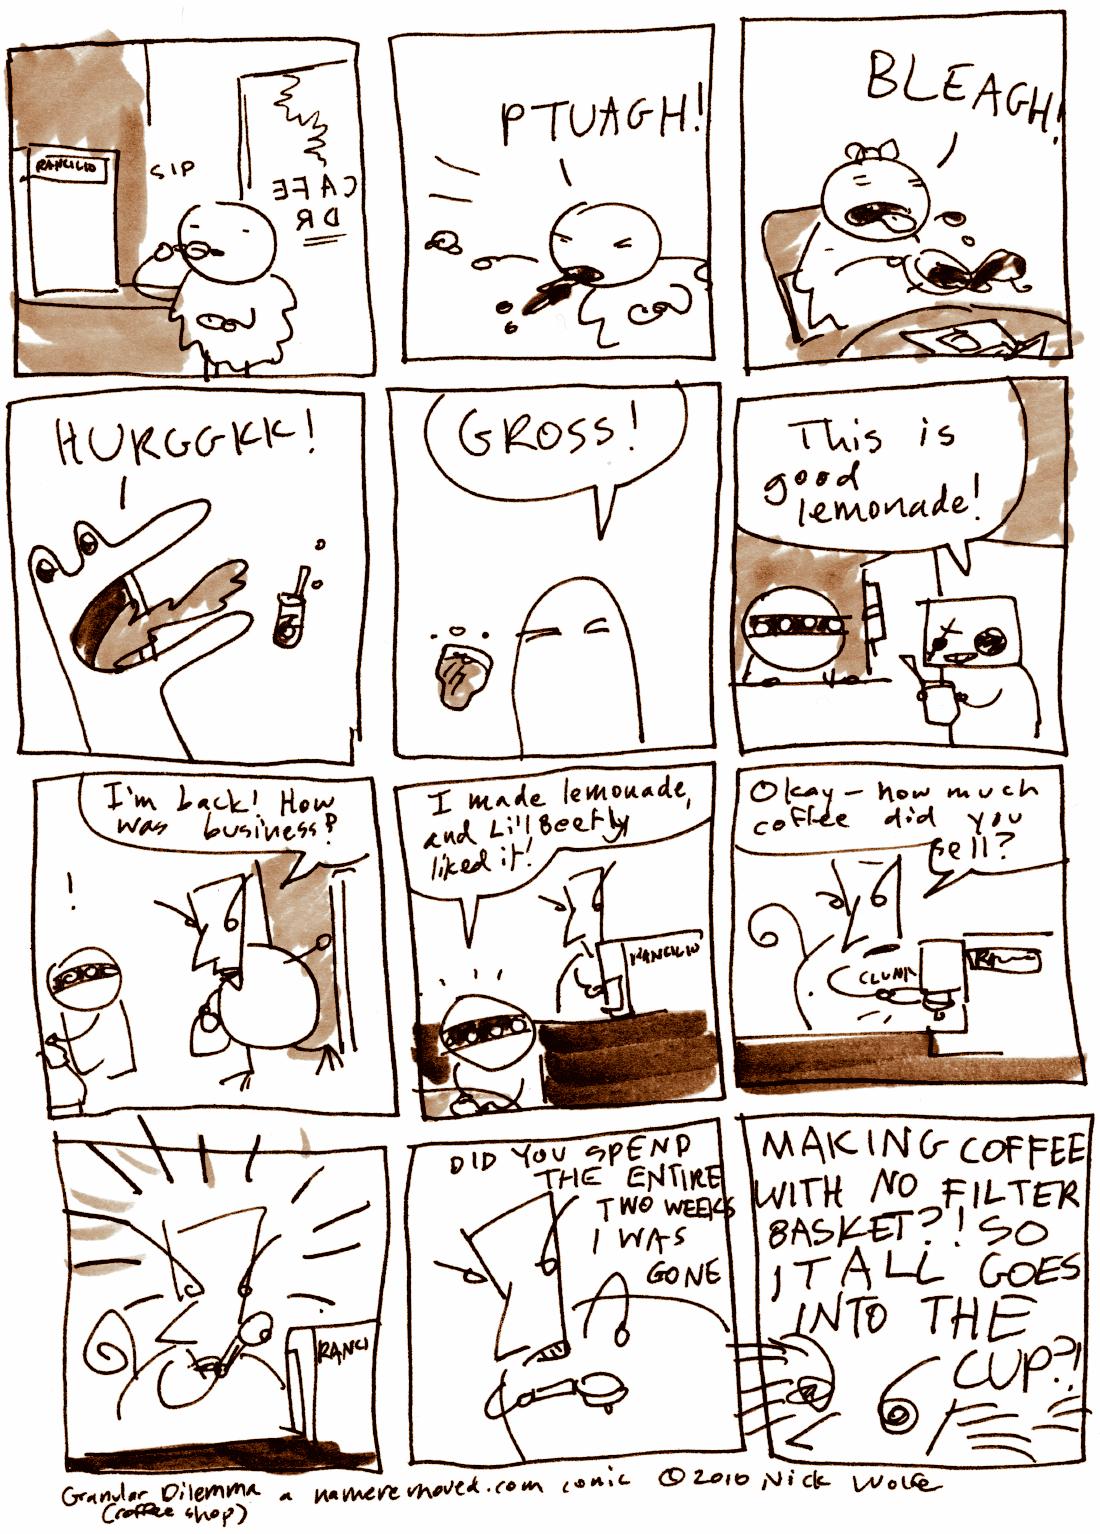 Granular Dilemma (coffee shop)